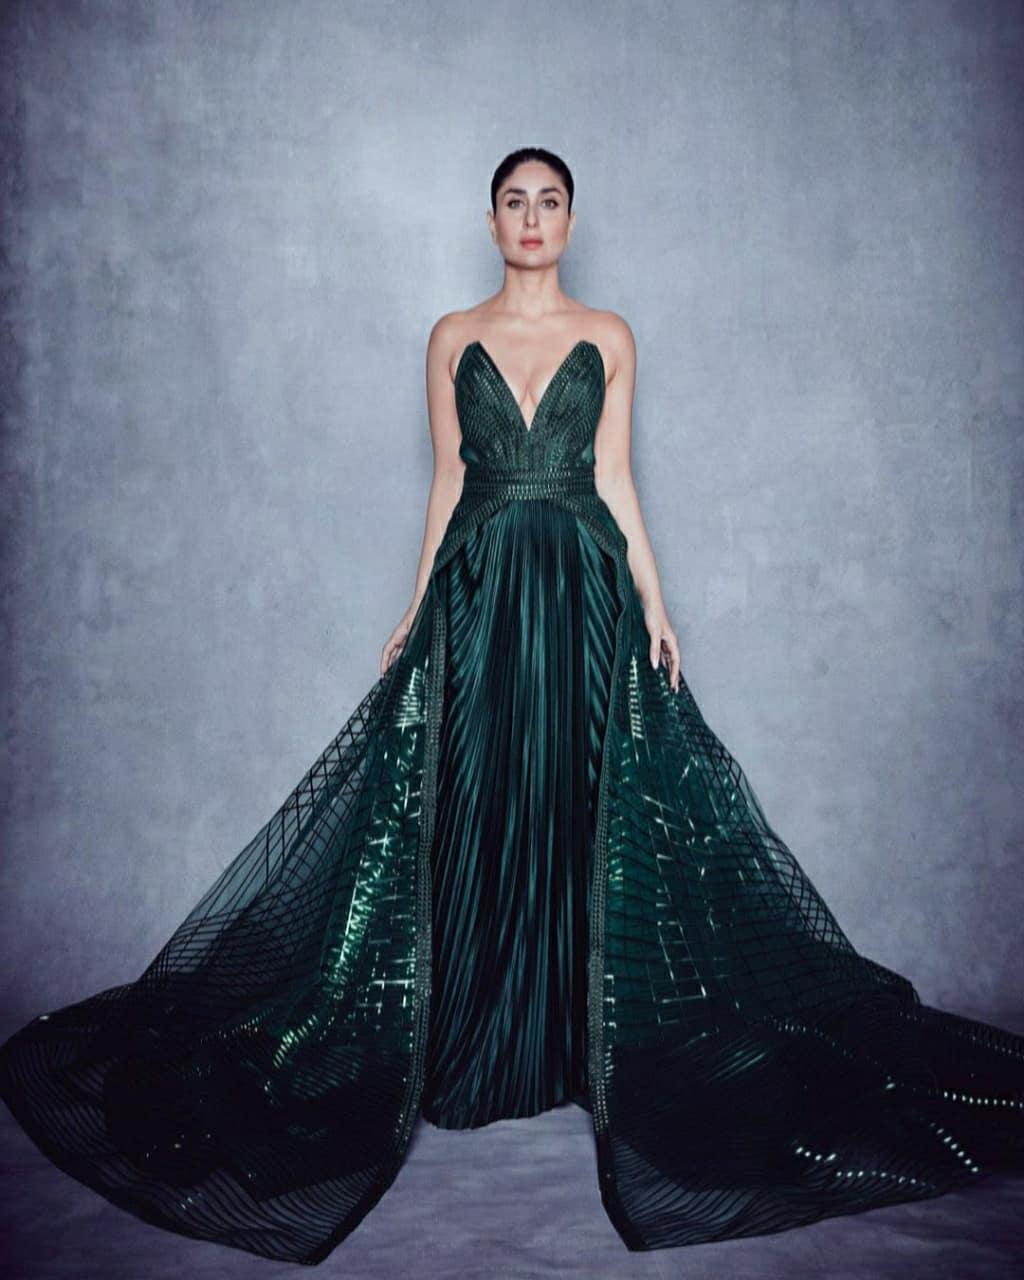 Deepika Padukone to Meghan Markle: 5 Celebrities Who Slayed in Green